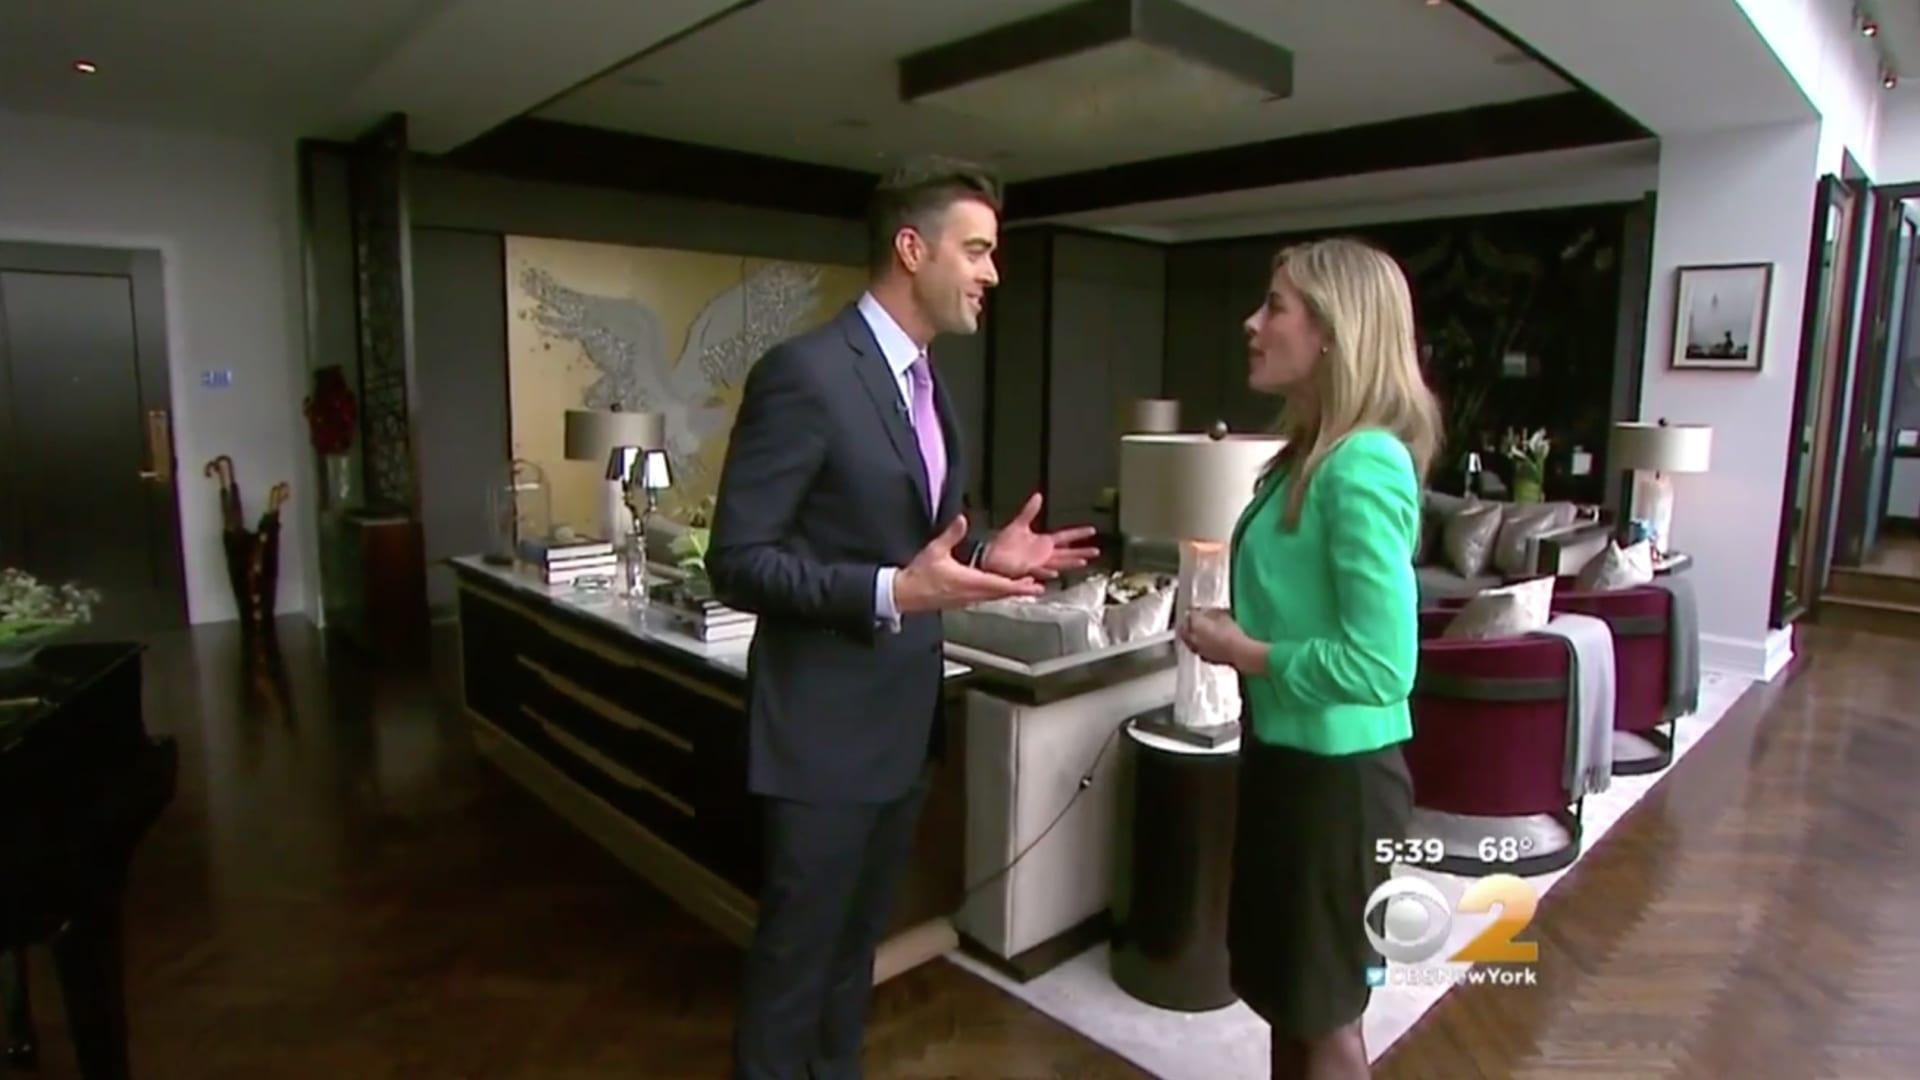 Noble Black Showing Spectacular Plaza Penthouse on CBS Living Large